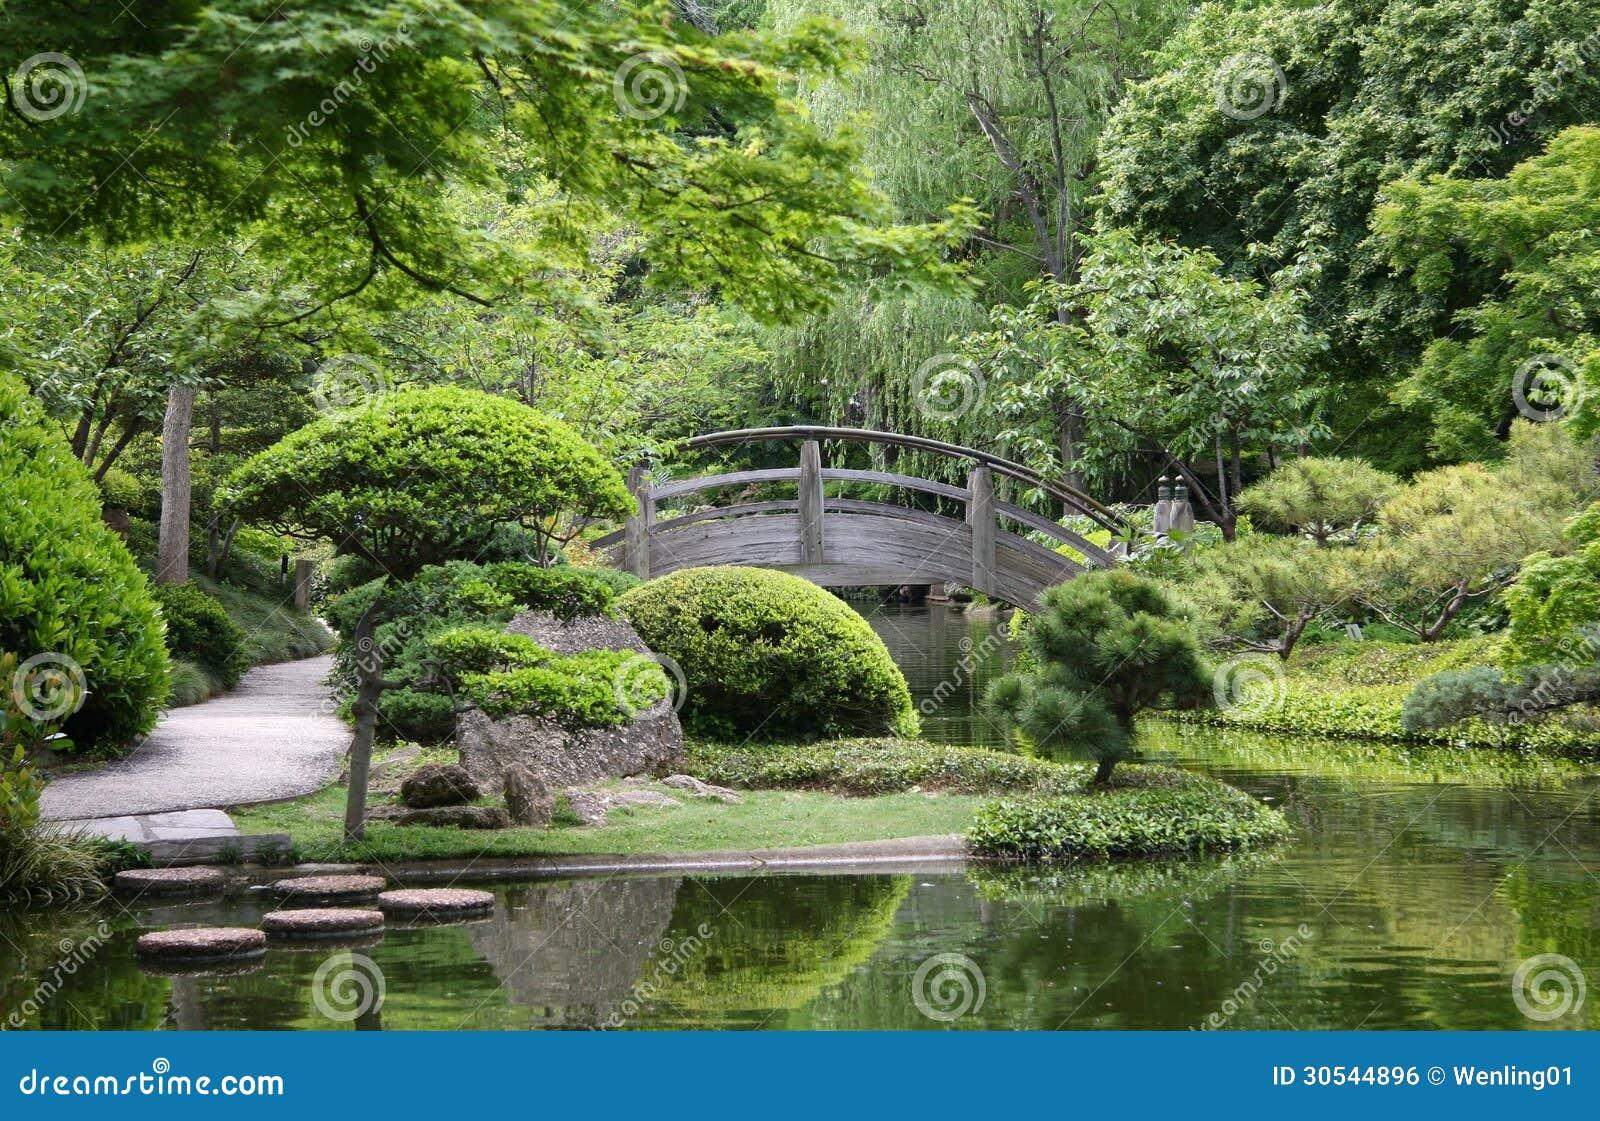 Bridge In Japanese Garden Stock Photo Image Of Alley 30544896